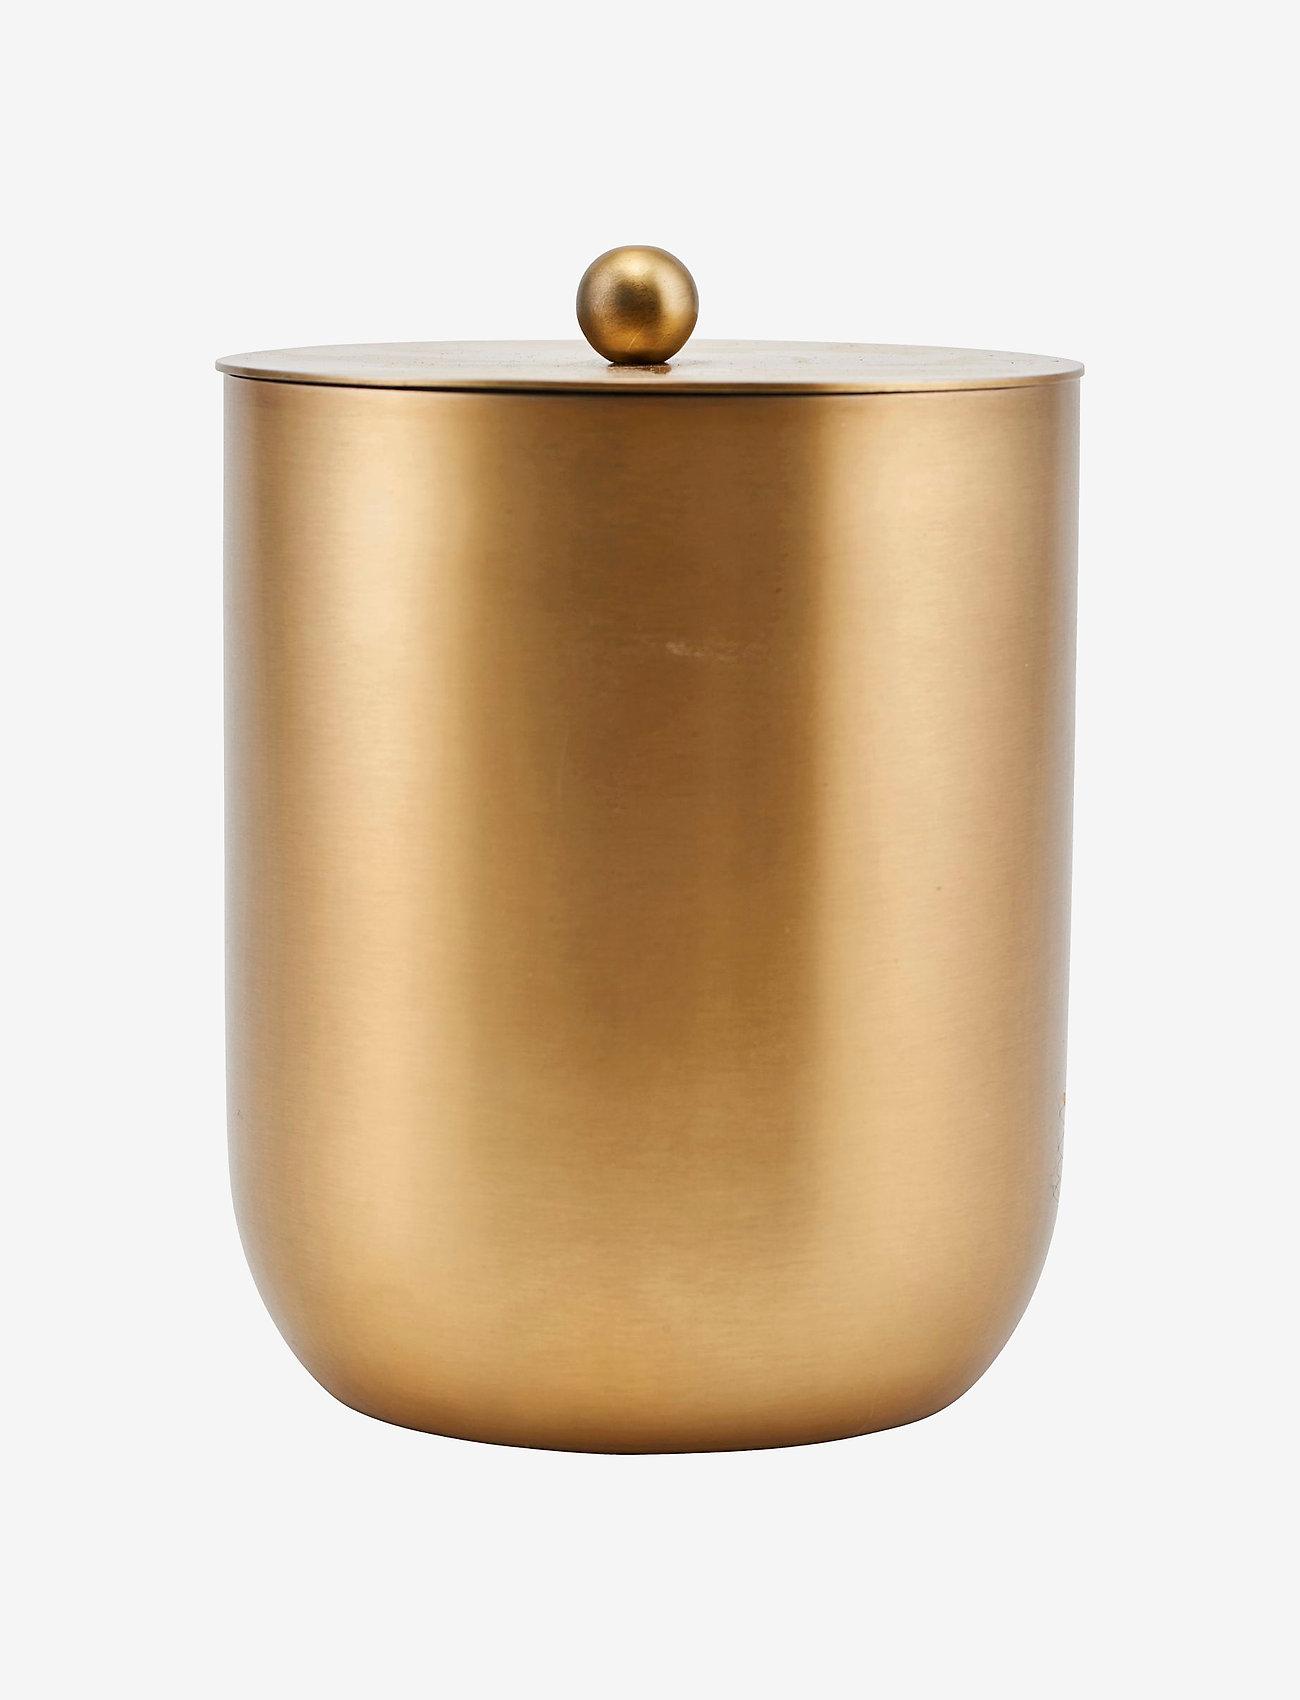 house doctor - Alir Ice/wine bucket - brass finish - 0